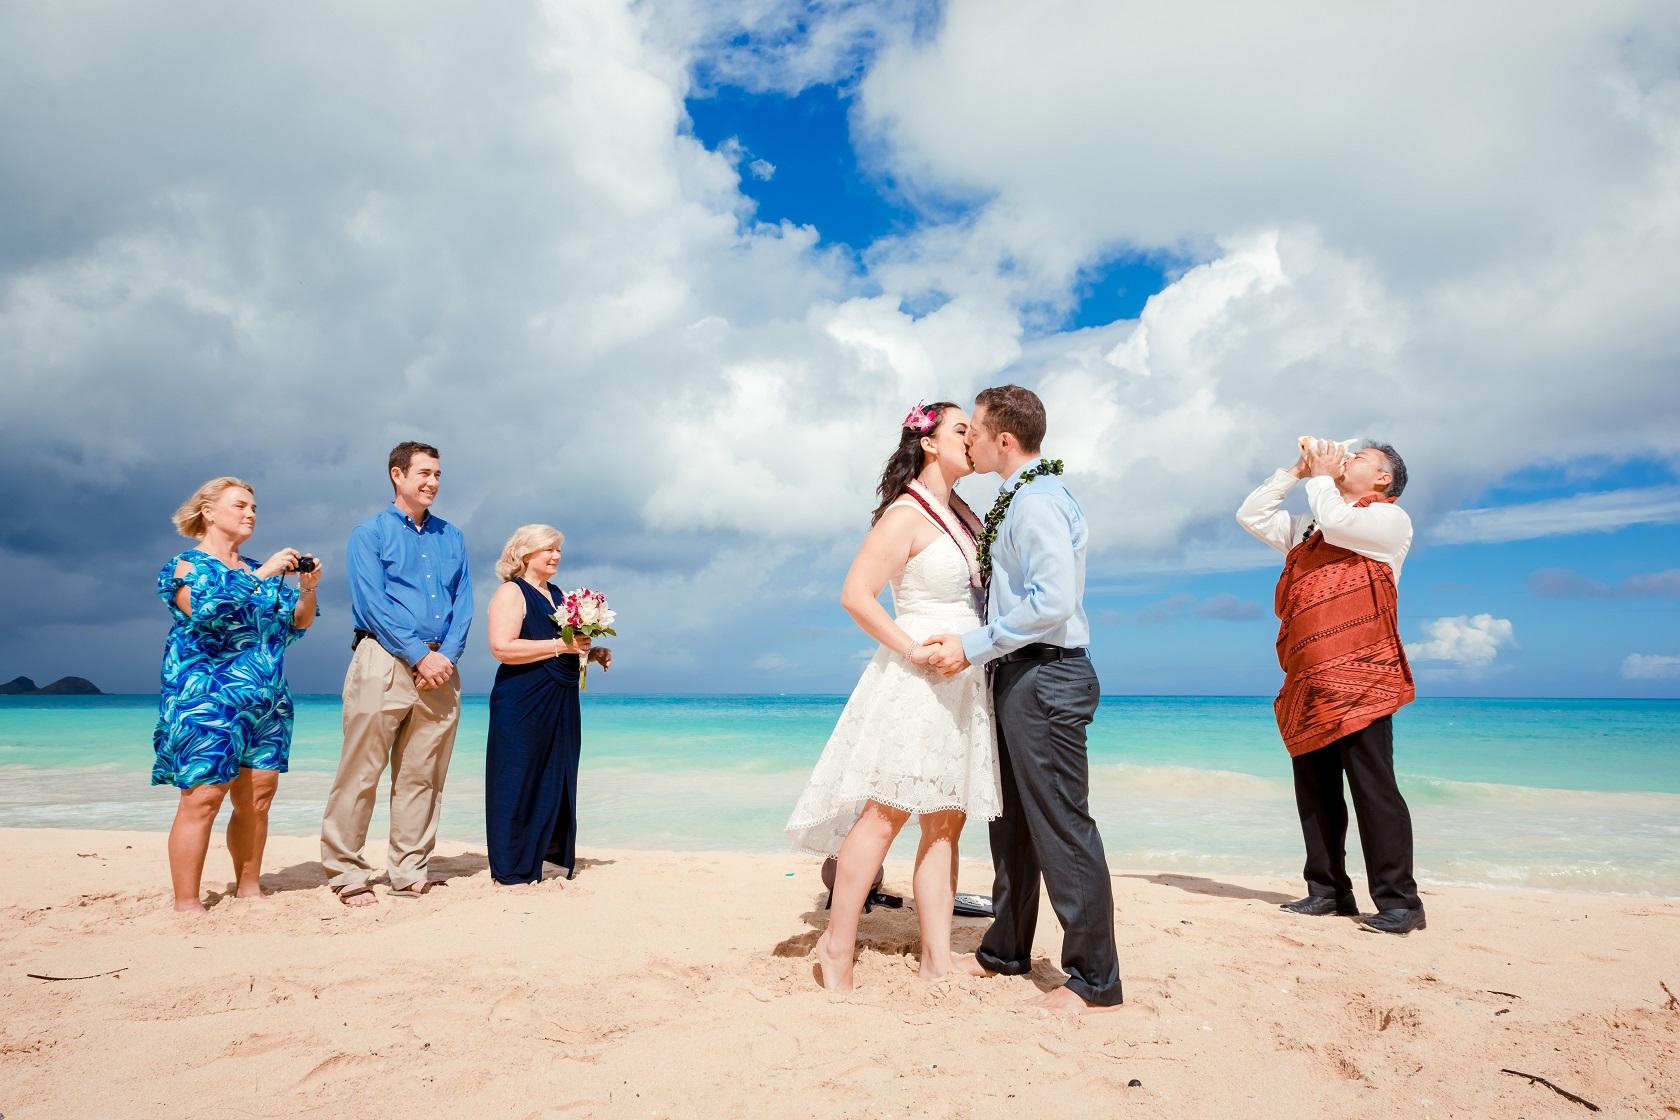 Claire & Jarrod's elopement started off in sunshine...